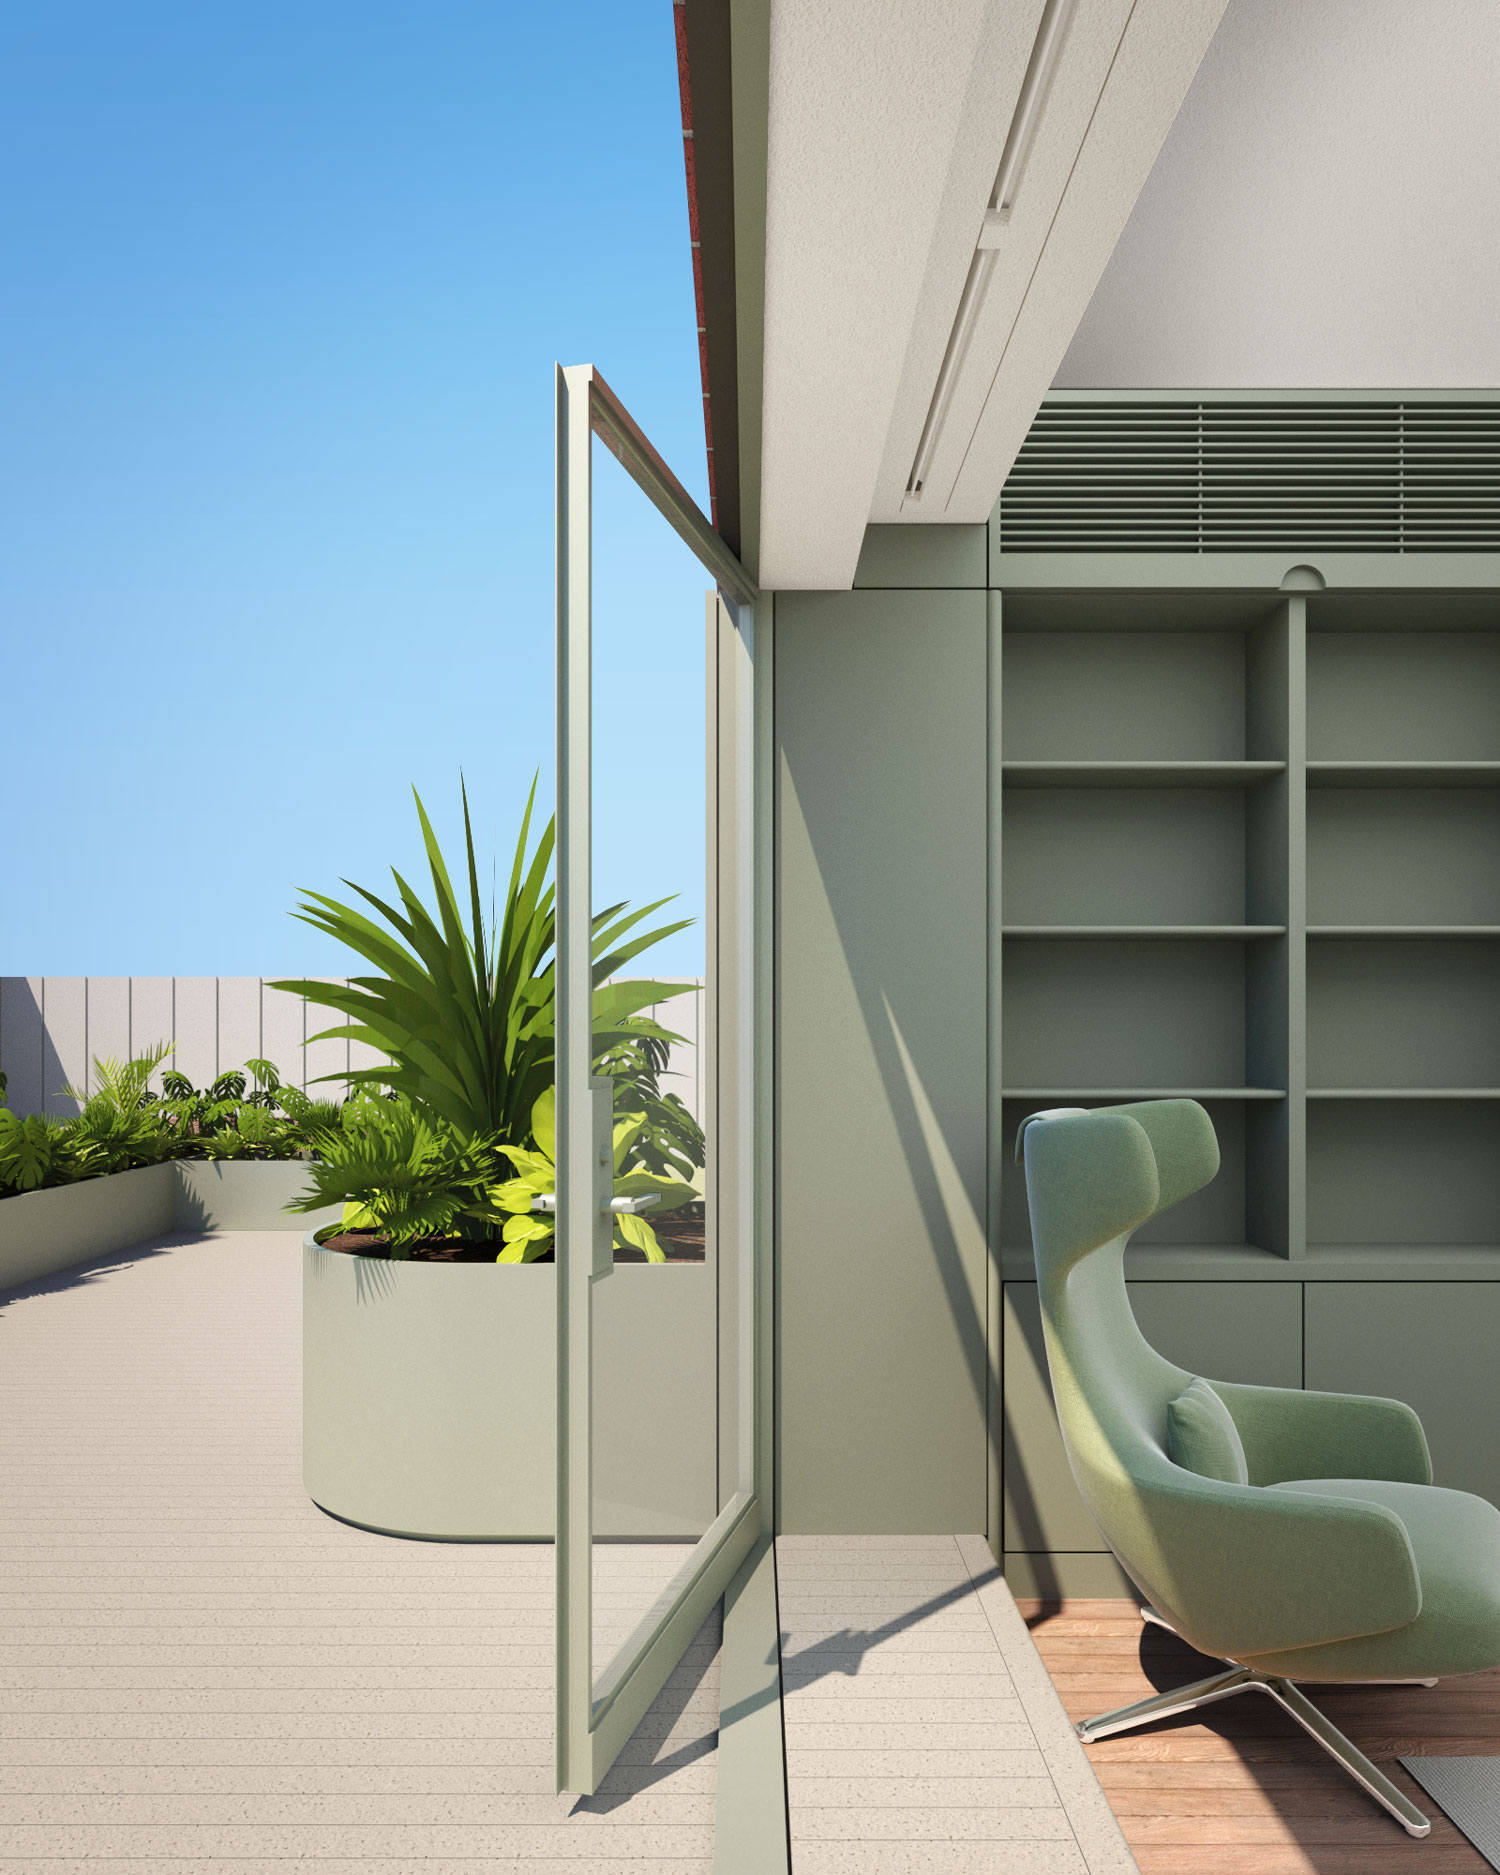 exterior-patio-threshold.jpg